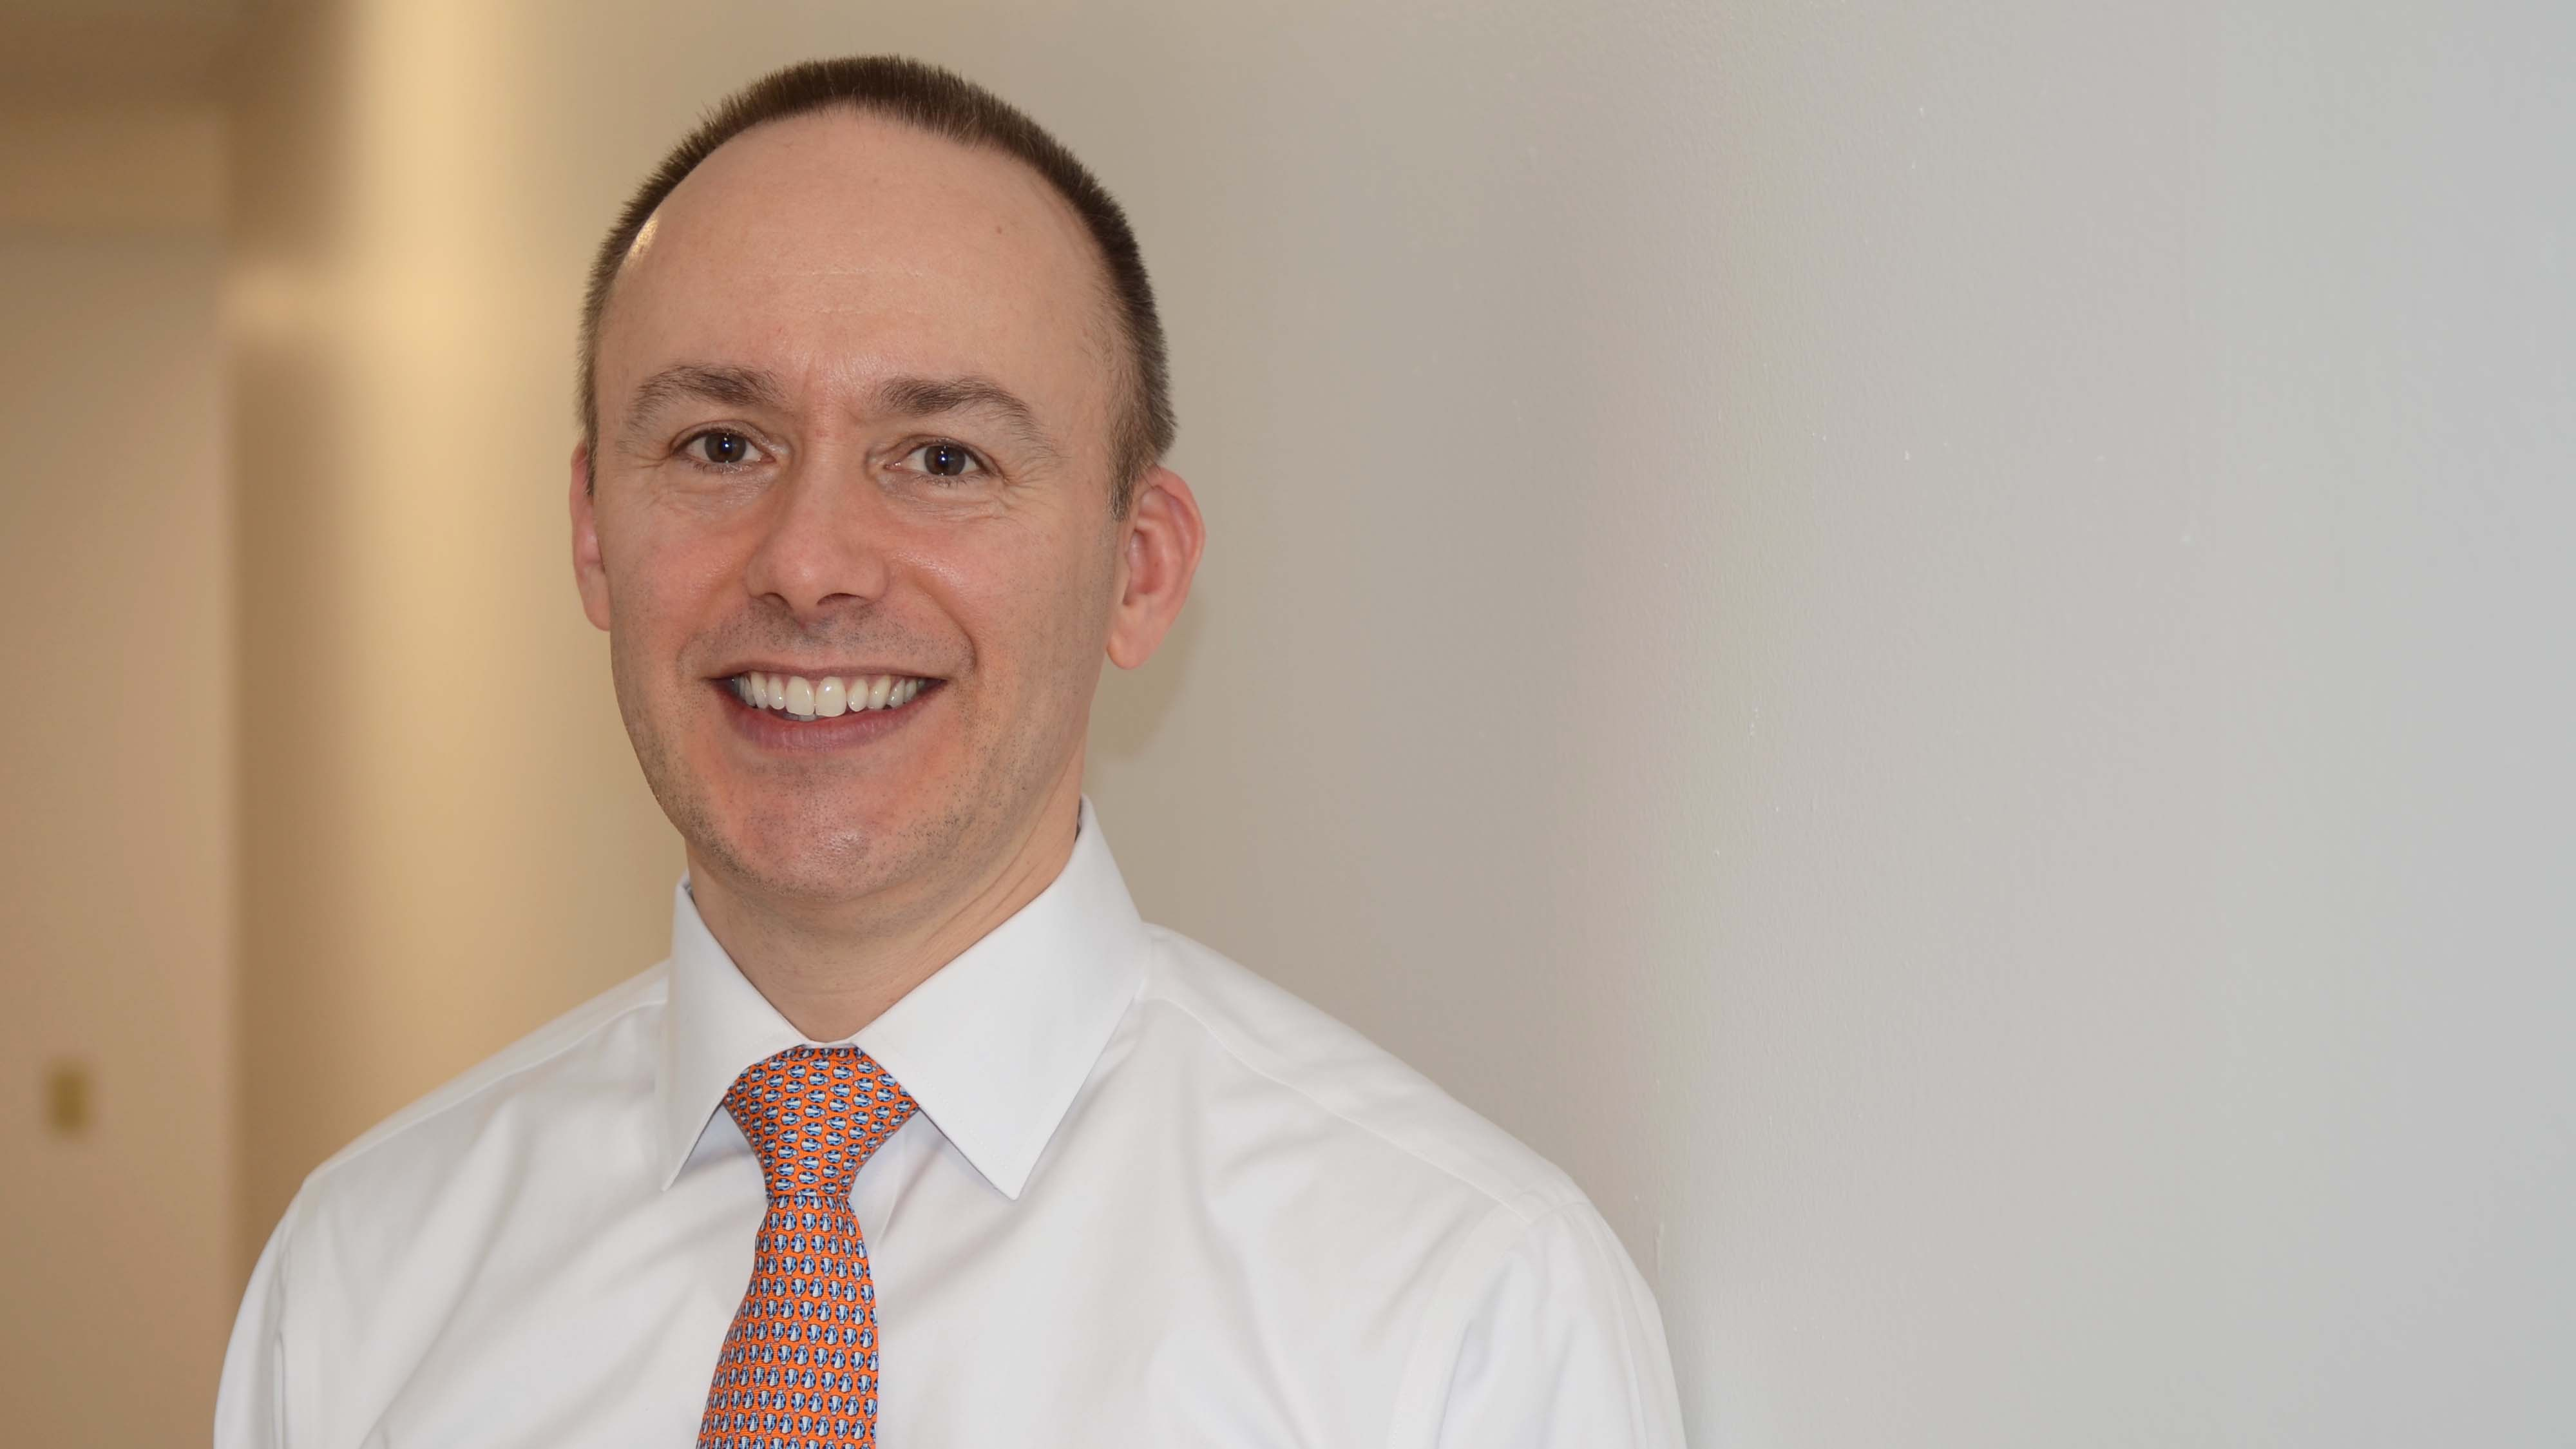 Klaus Kjaer Associate Professor of Clinical Anesthesiology